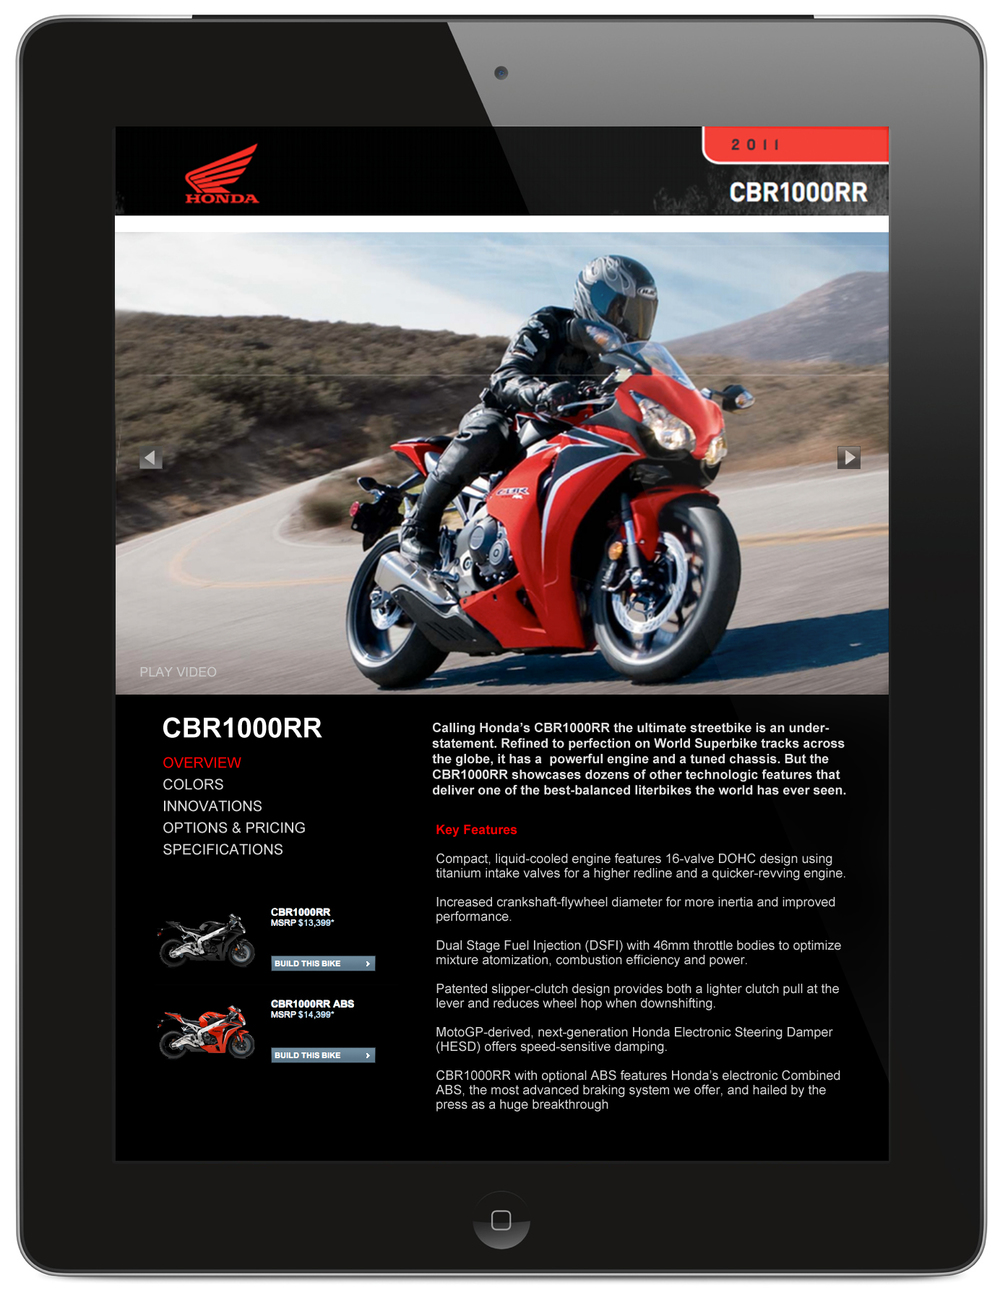 Honda_iPad_App_Overview.jpg